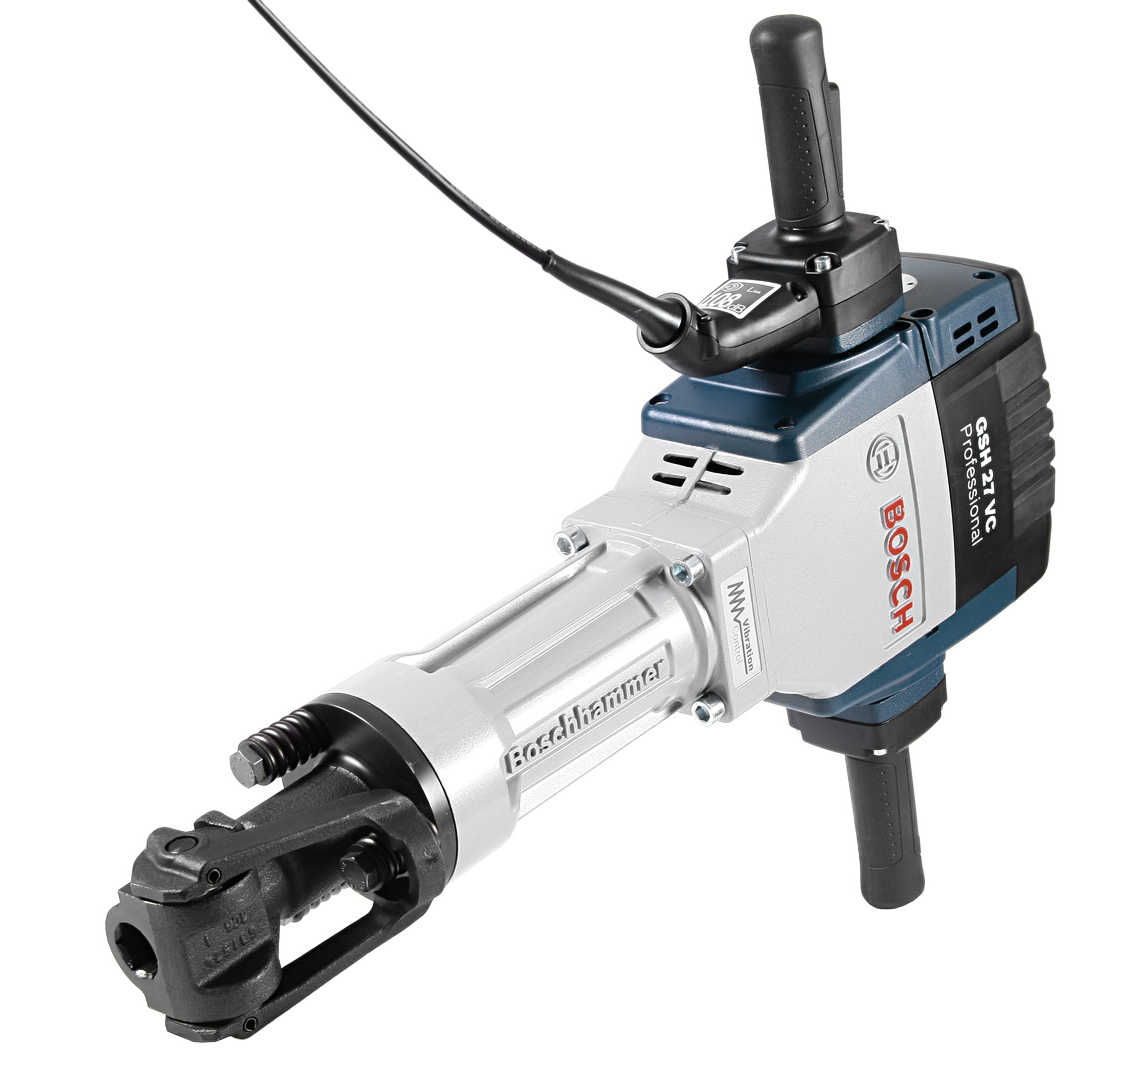 Отбойный молоток Bosch Gsh 27 vc (0.611.30a.000)